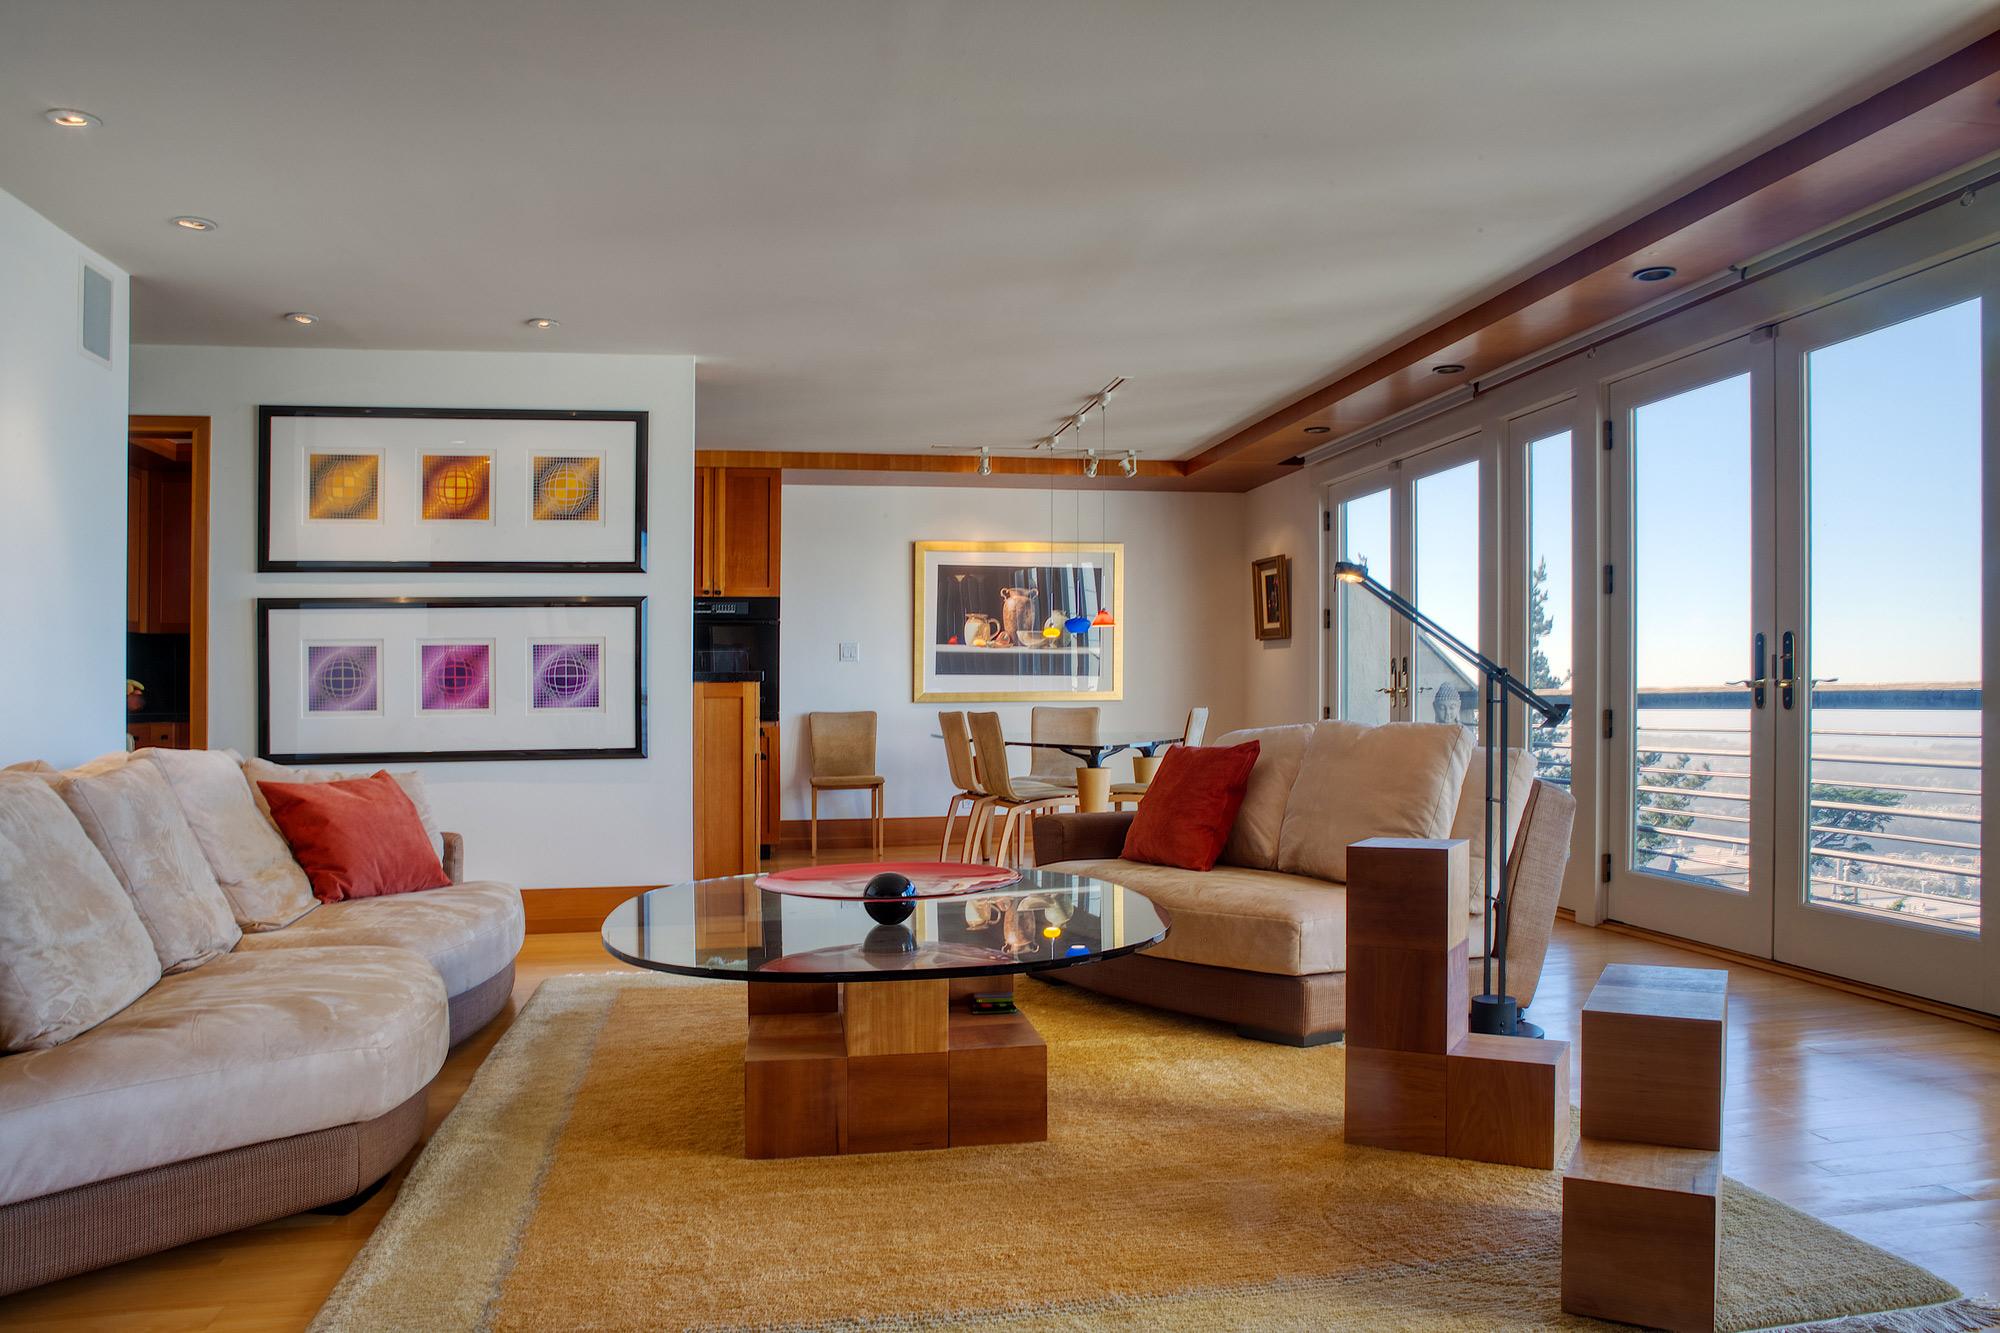 Kaplan-Architects-San Francisco-remodel-living-room-2.jpg